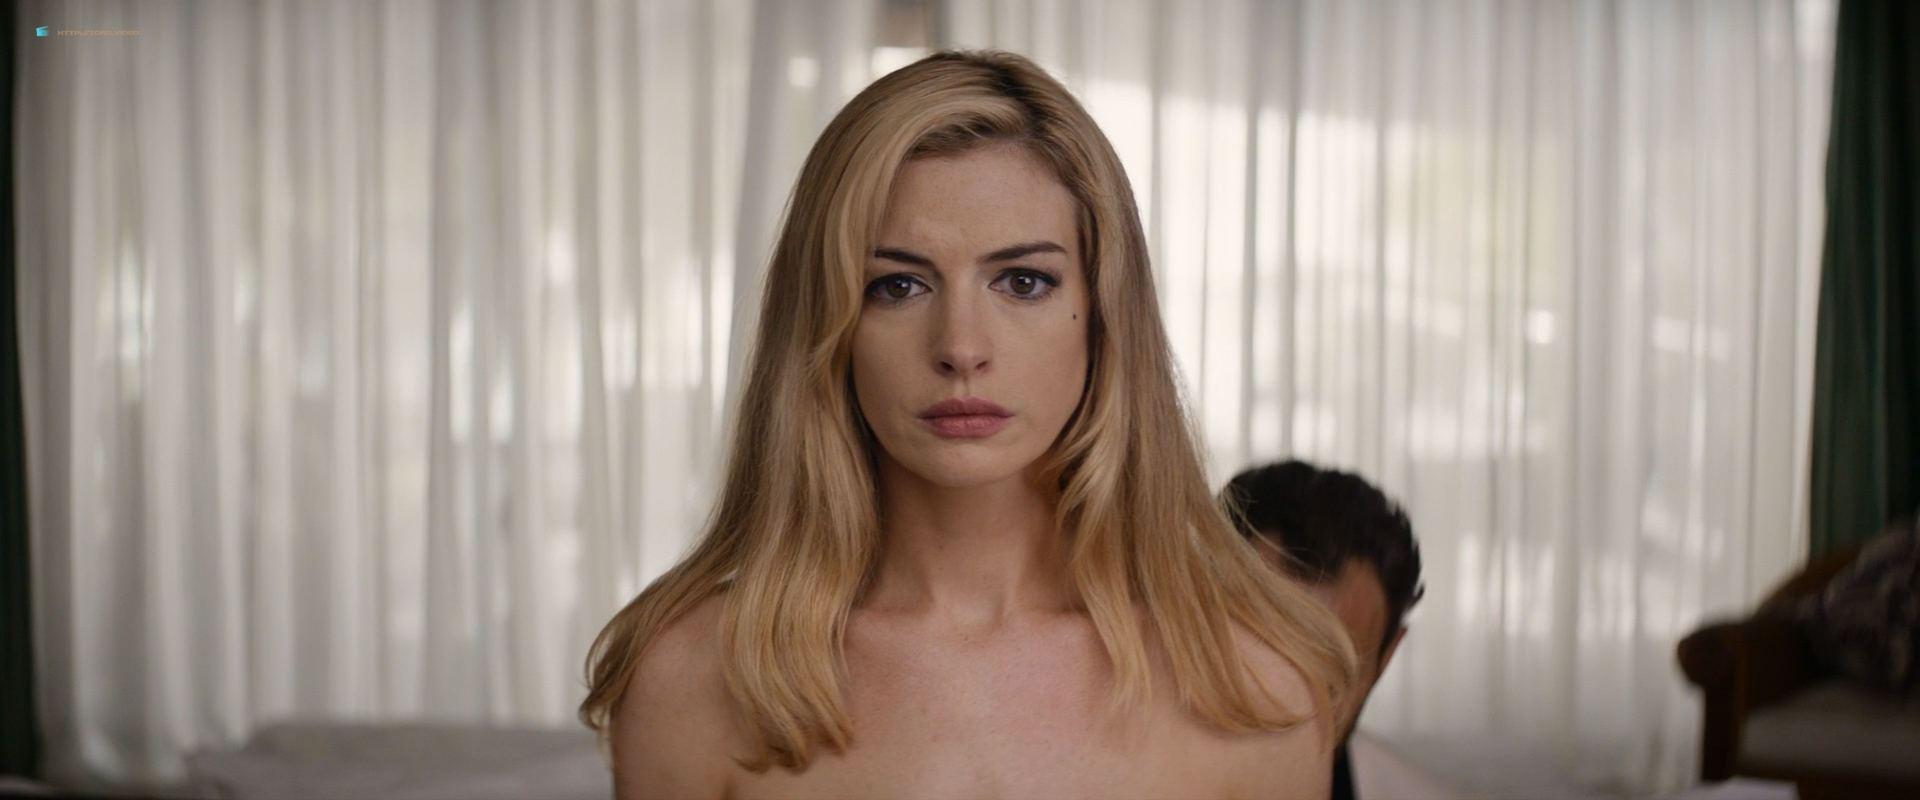 0201153347964_12_Anne-Hathaway-hot-in-sex-scene-Serenity-2019-HD-1080p-BluRay-00005.jpg